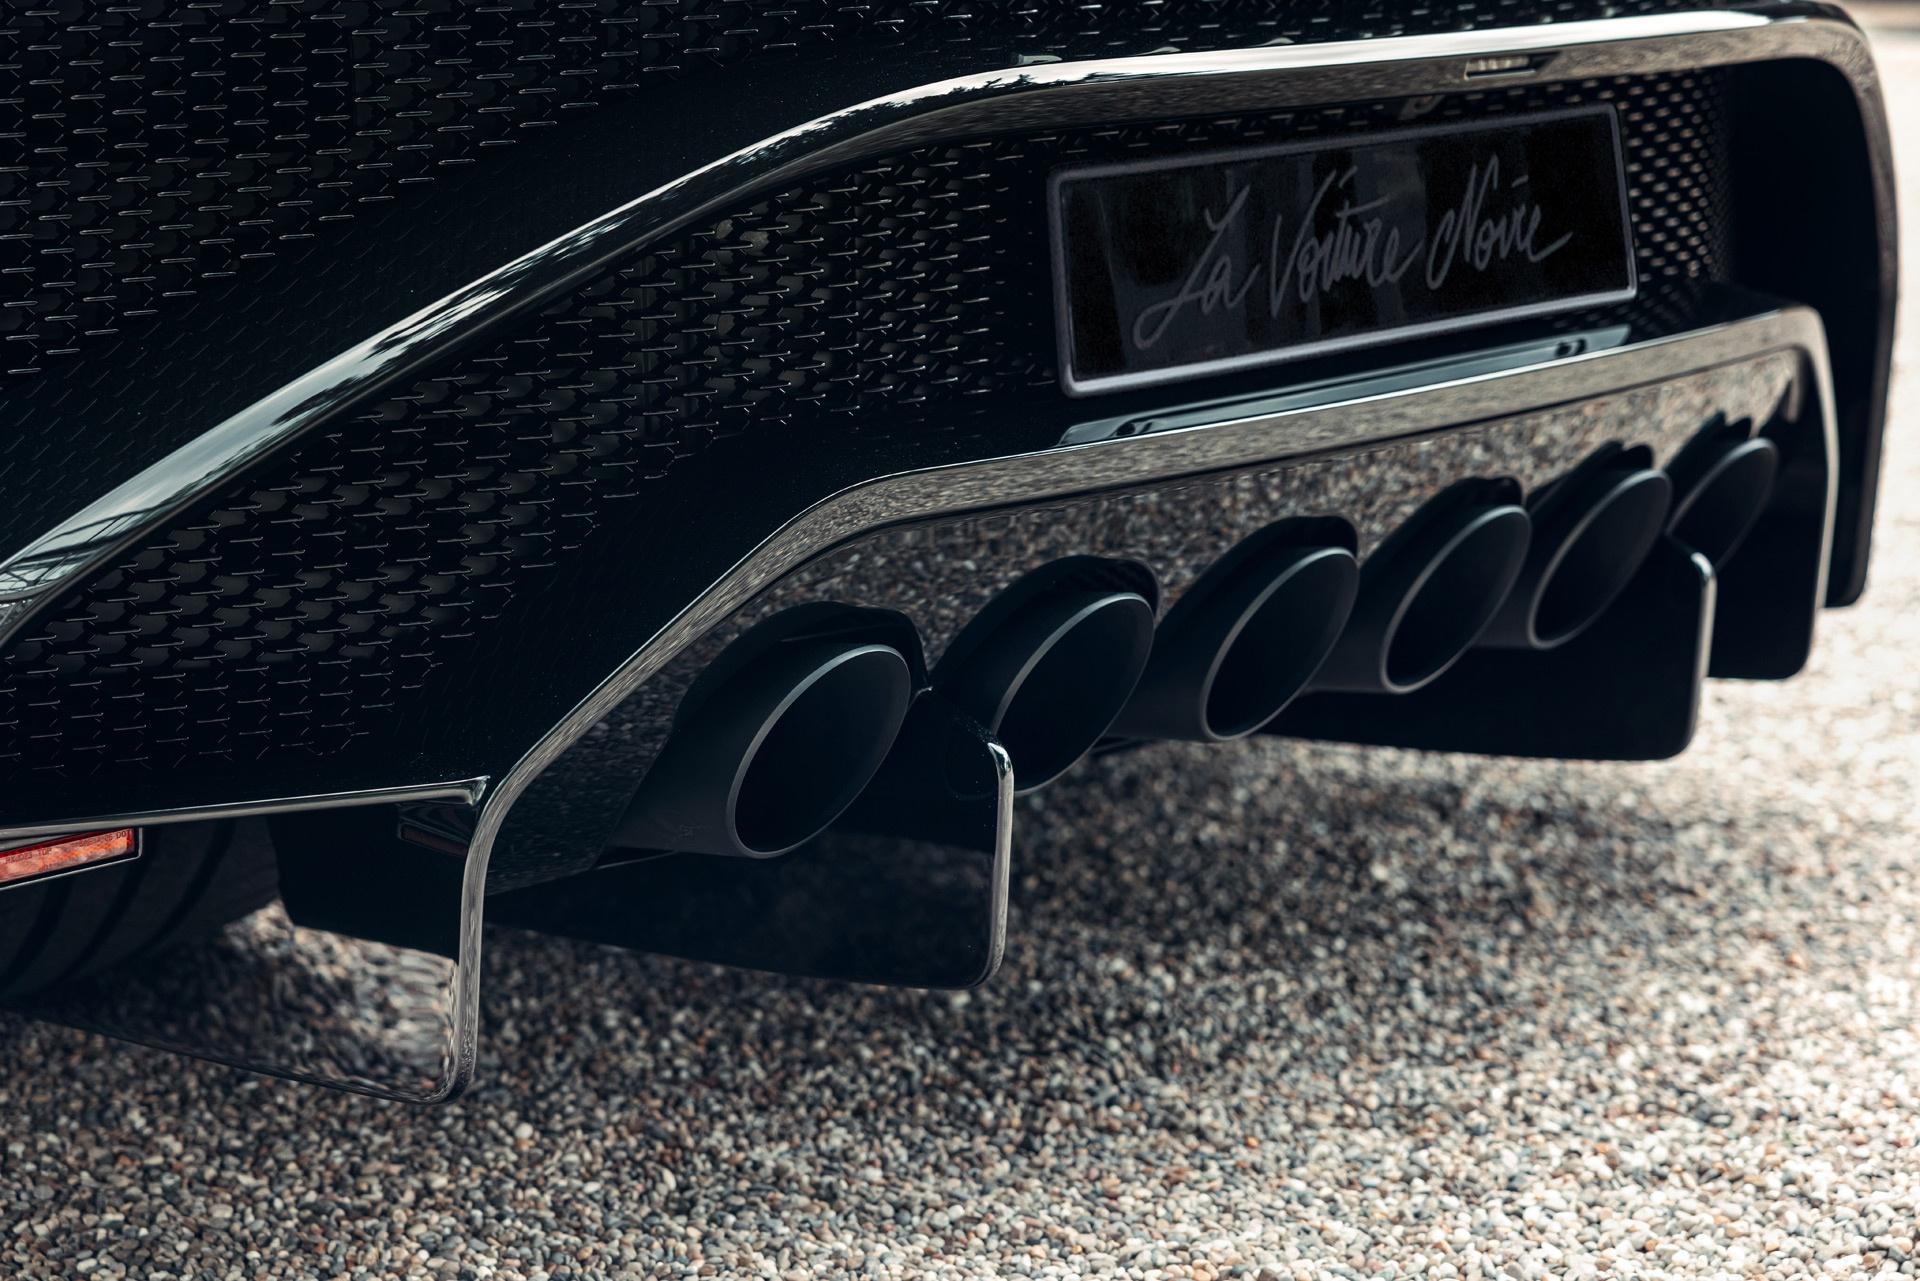 Bugatti La Voiture Noire duoc giao cho khach hang anh 7